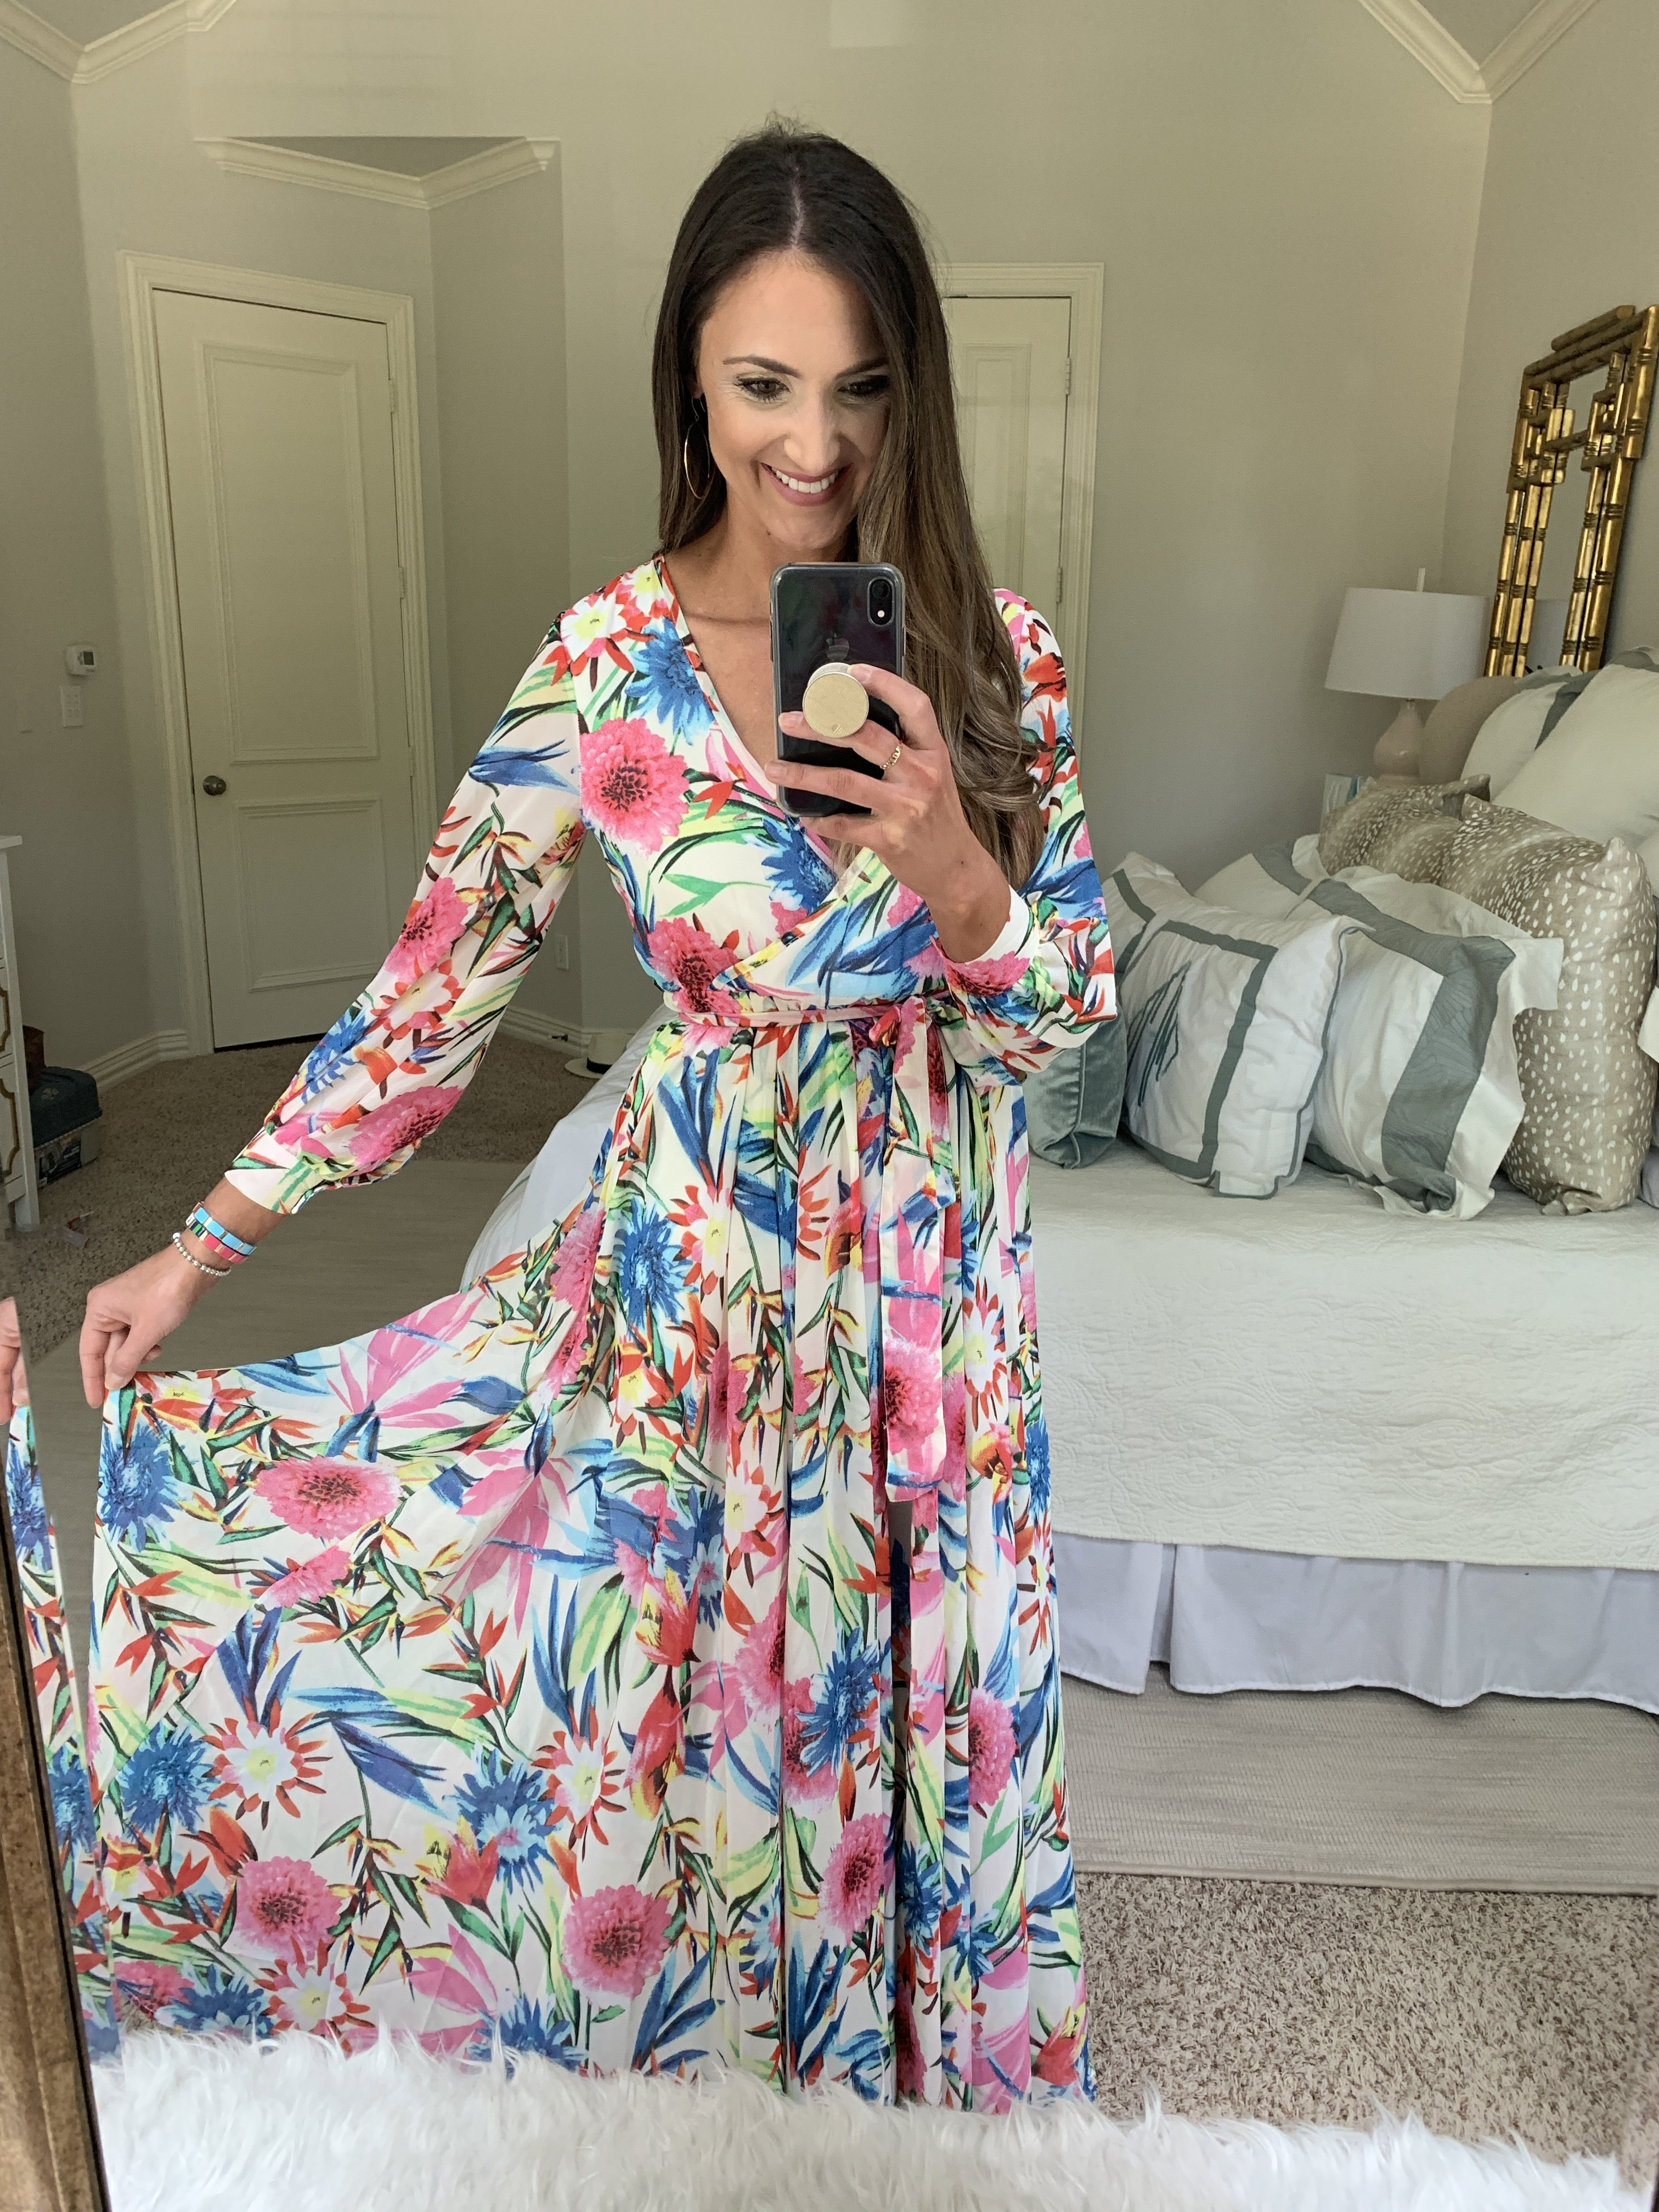 Floral Maxi Dress from amazon | Amazon Fashion Haul | Style Your Senses